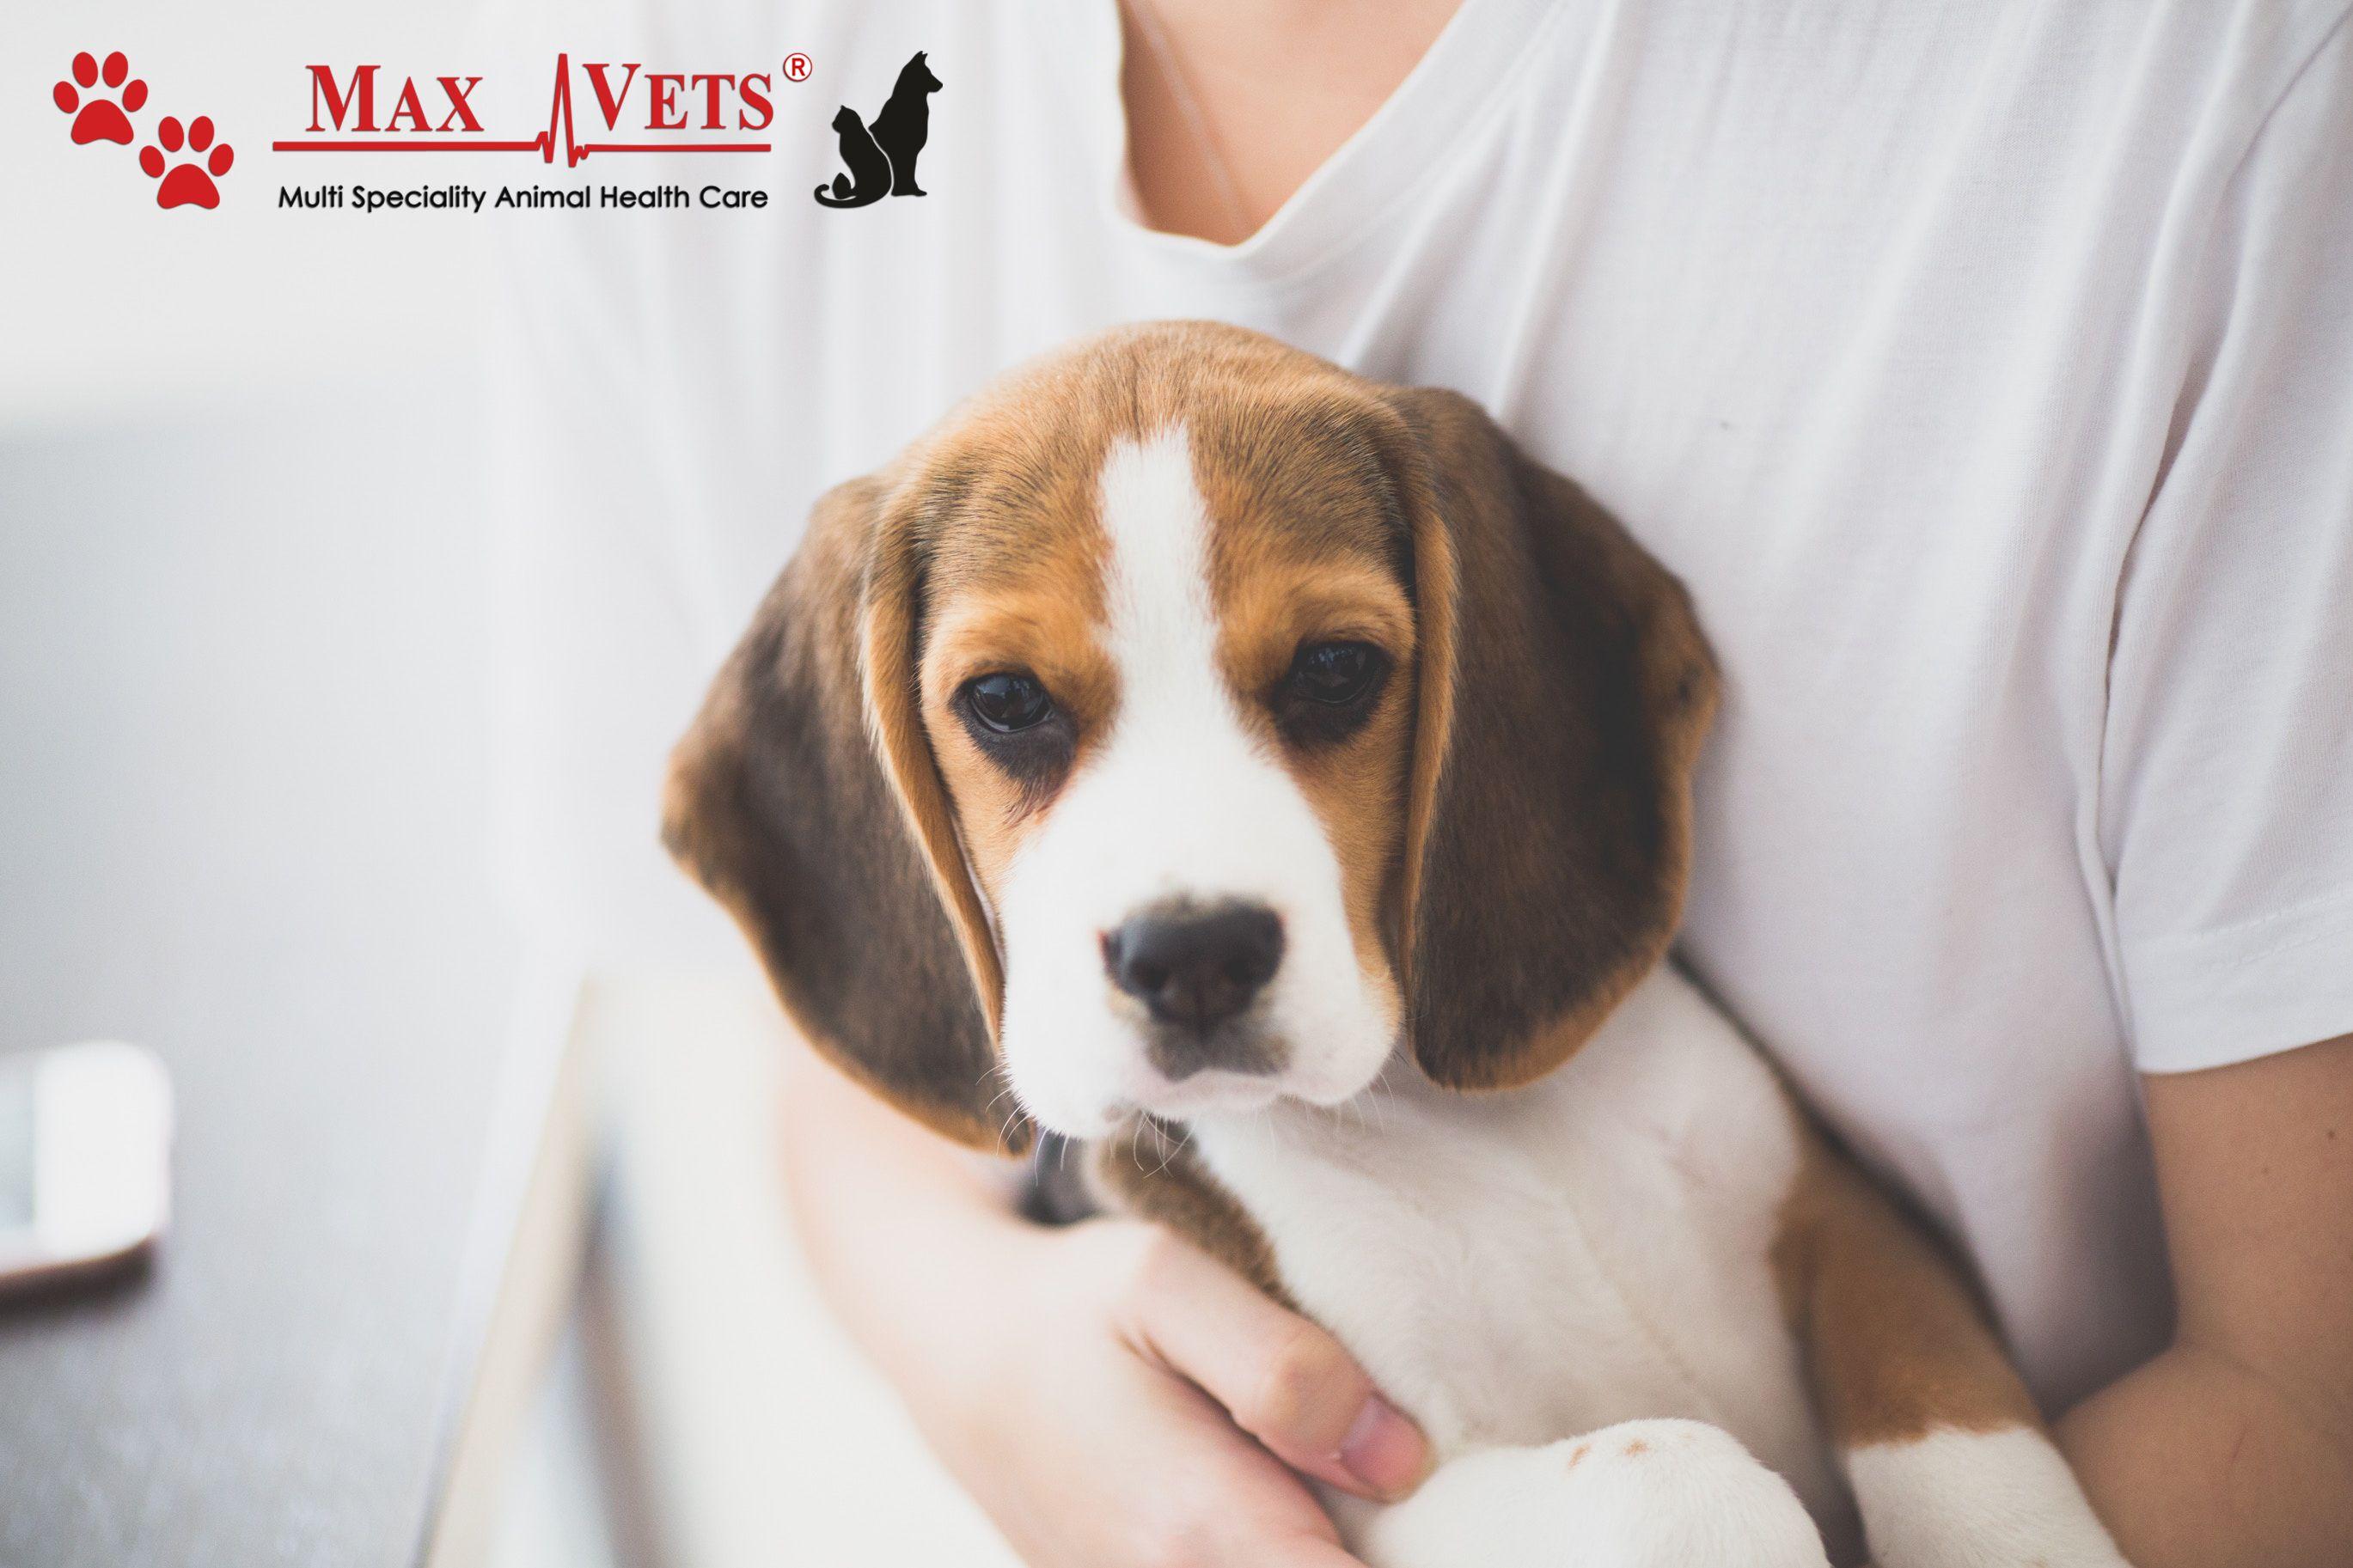 Come To Max Vets Pet Hospital In Newdelhi Delhi For Premier